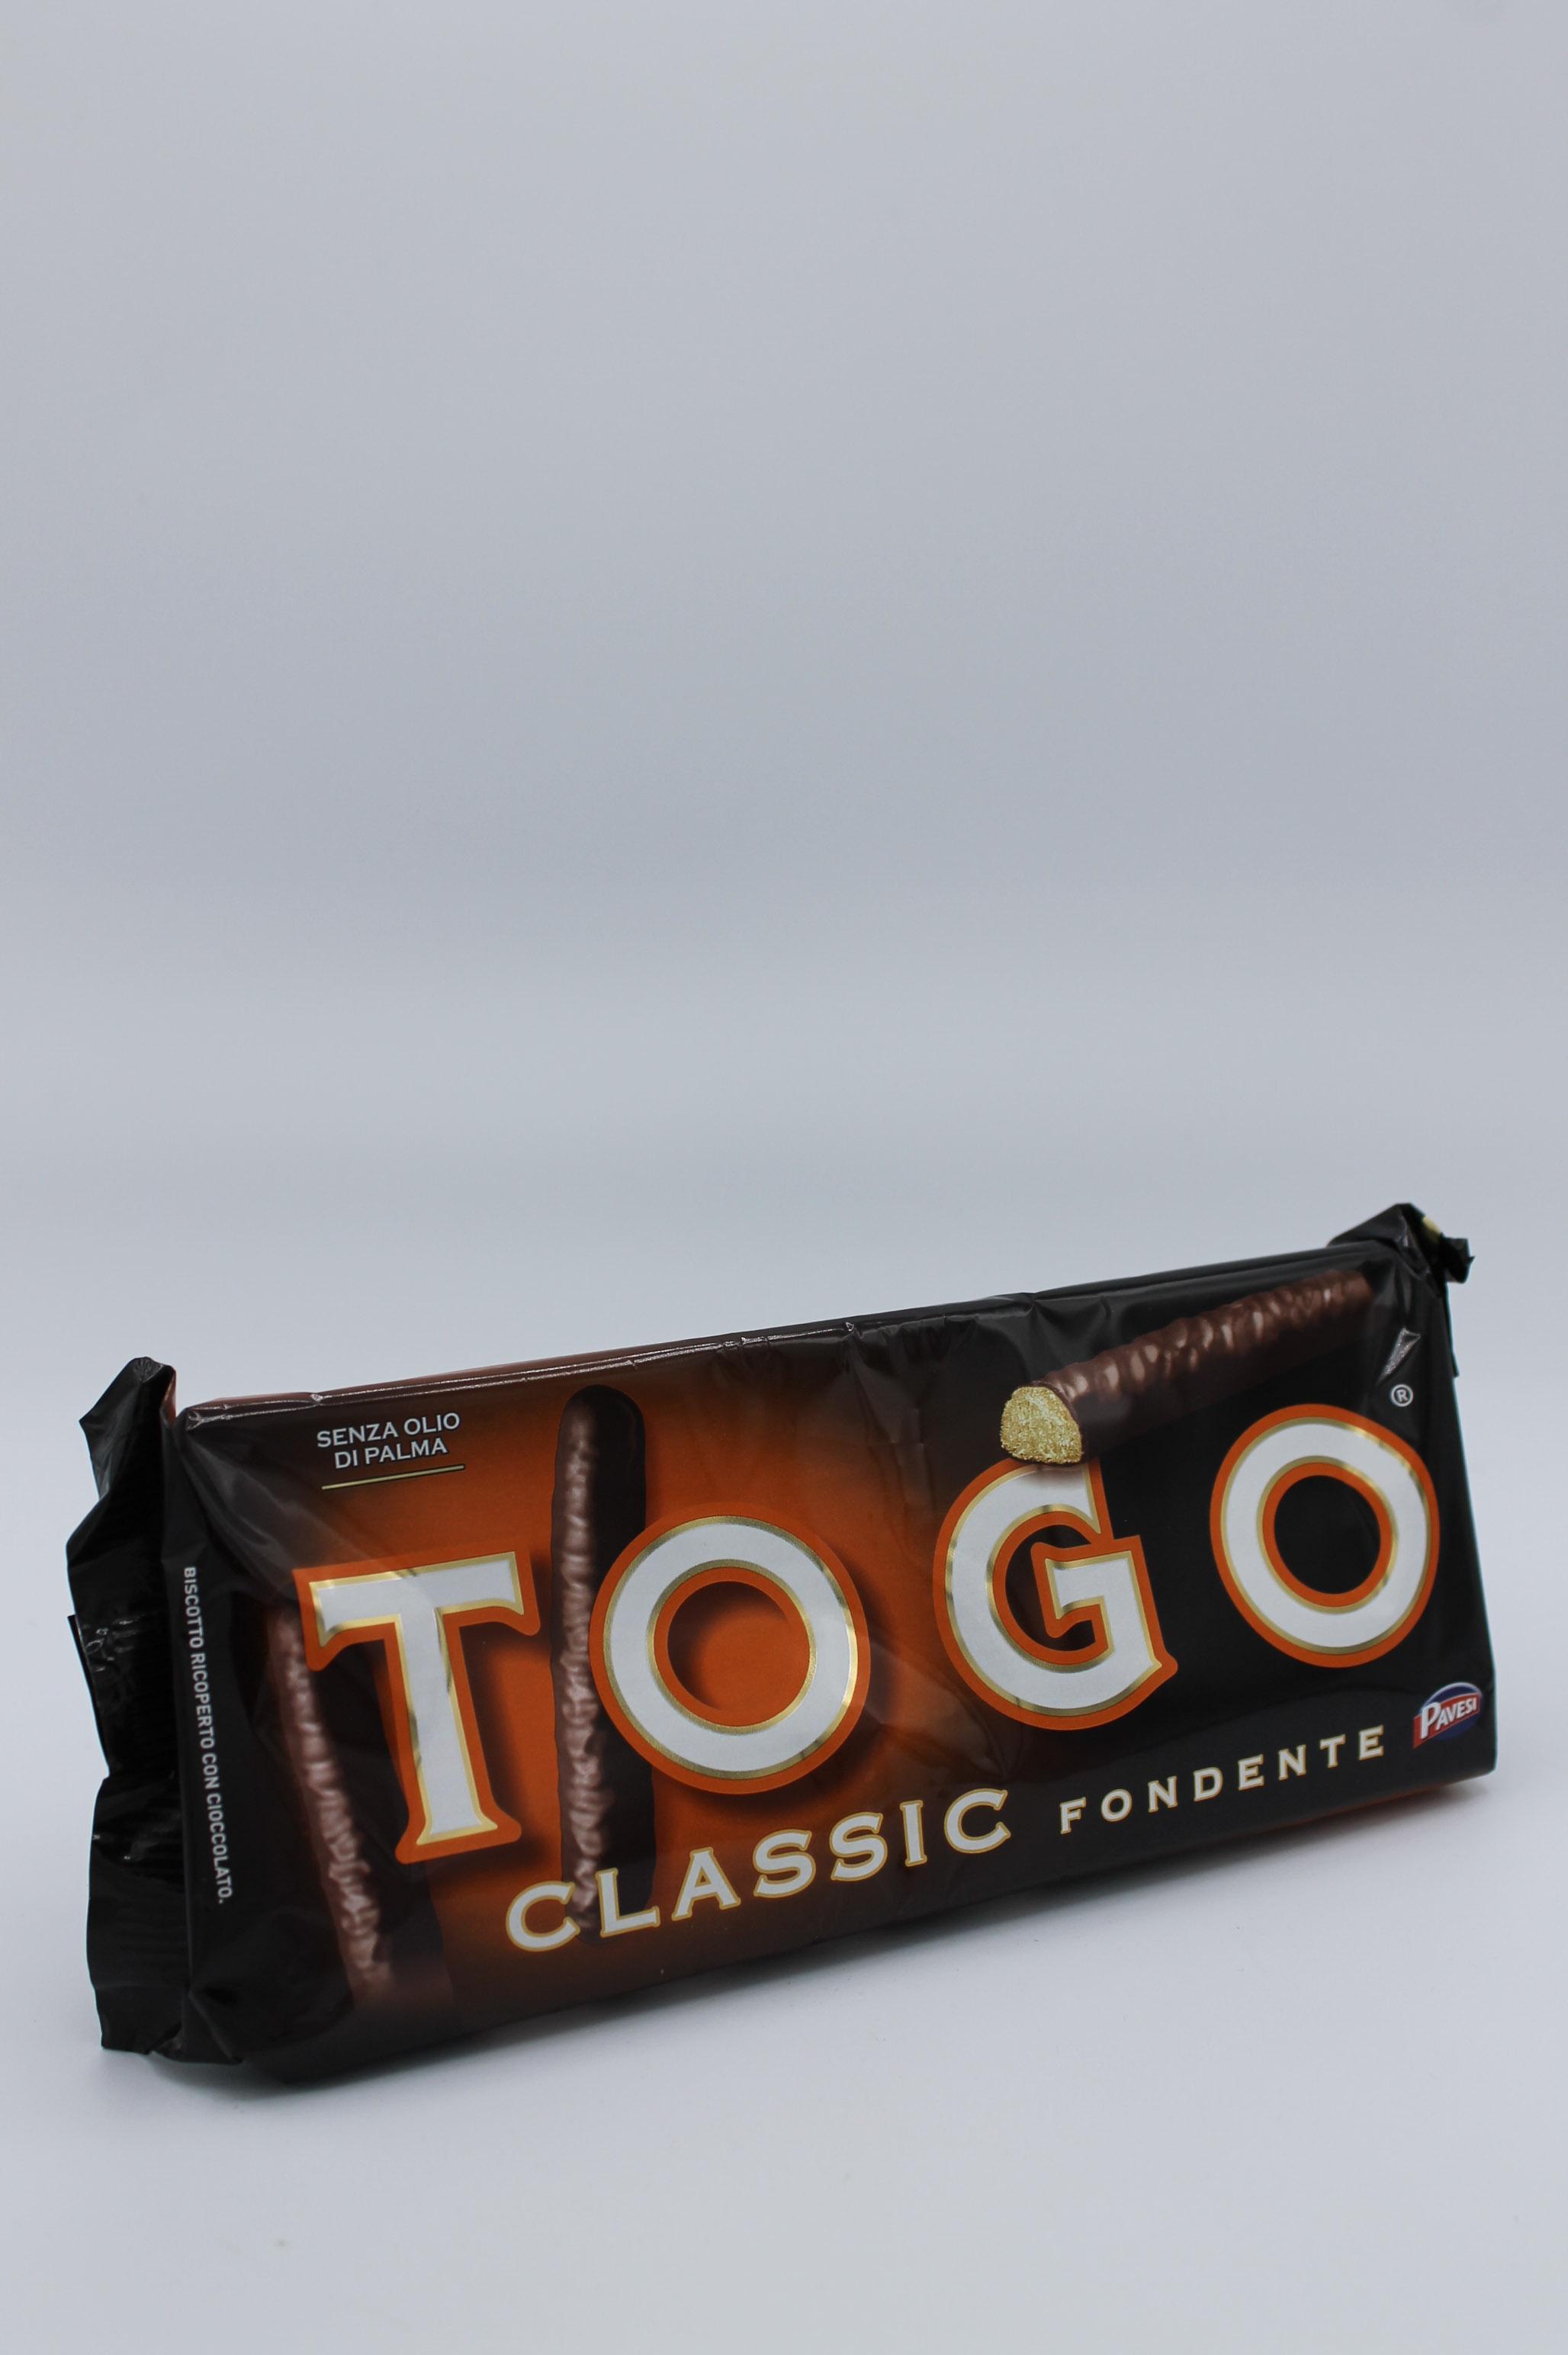 Pavesi togo classic 120 gr vari gusti.